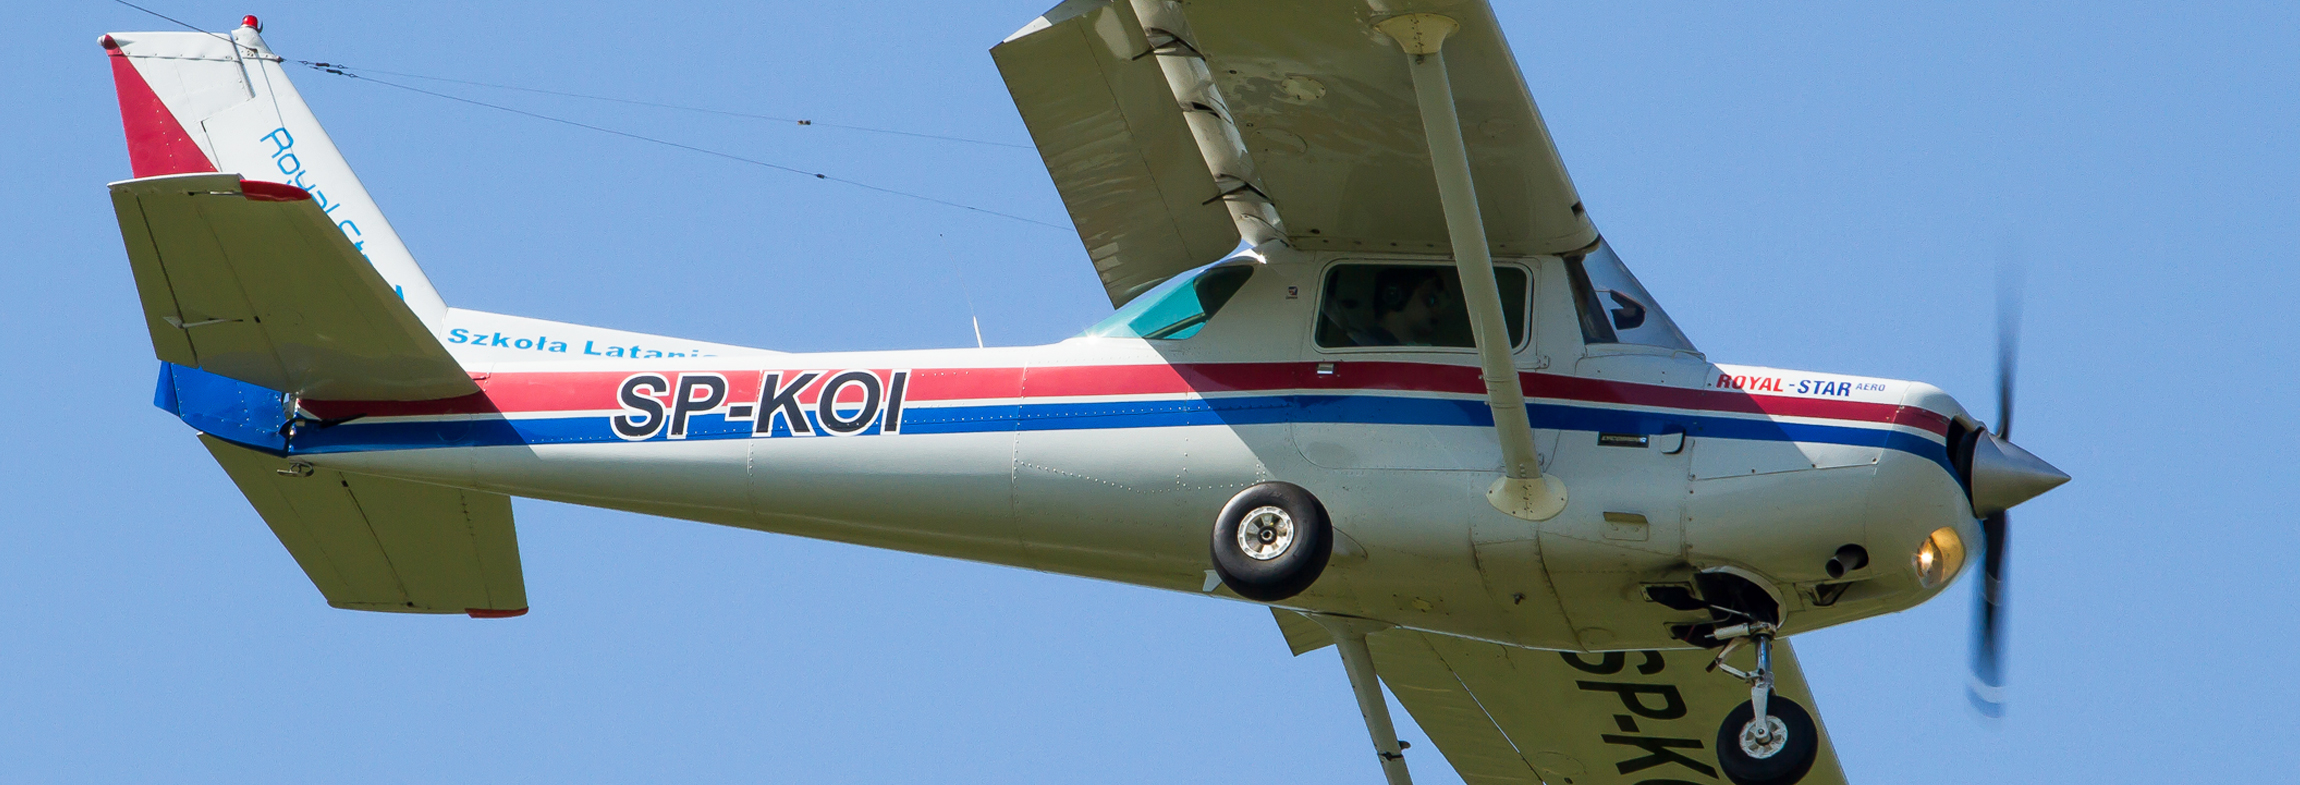 CESSNA C-152 SP-KOI